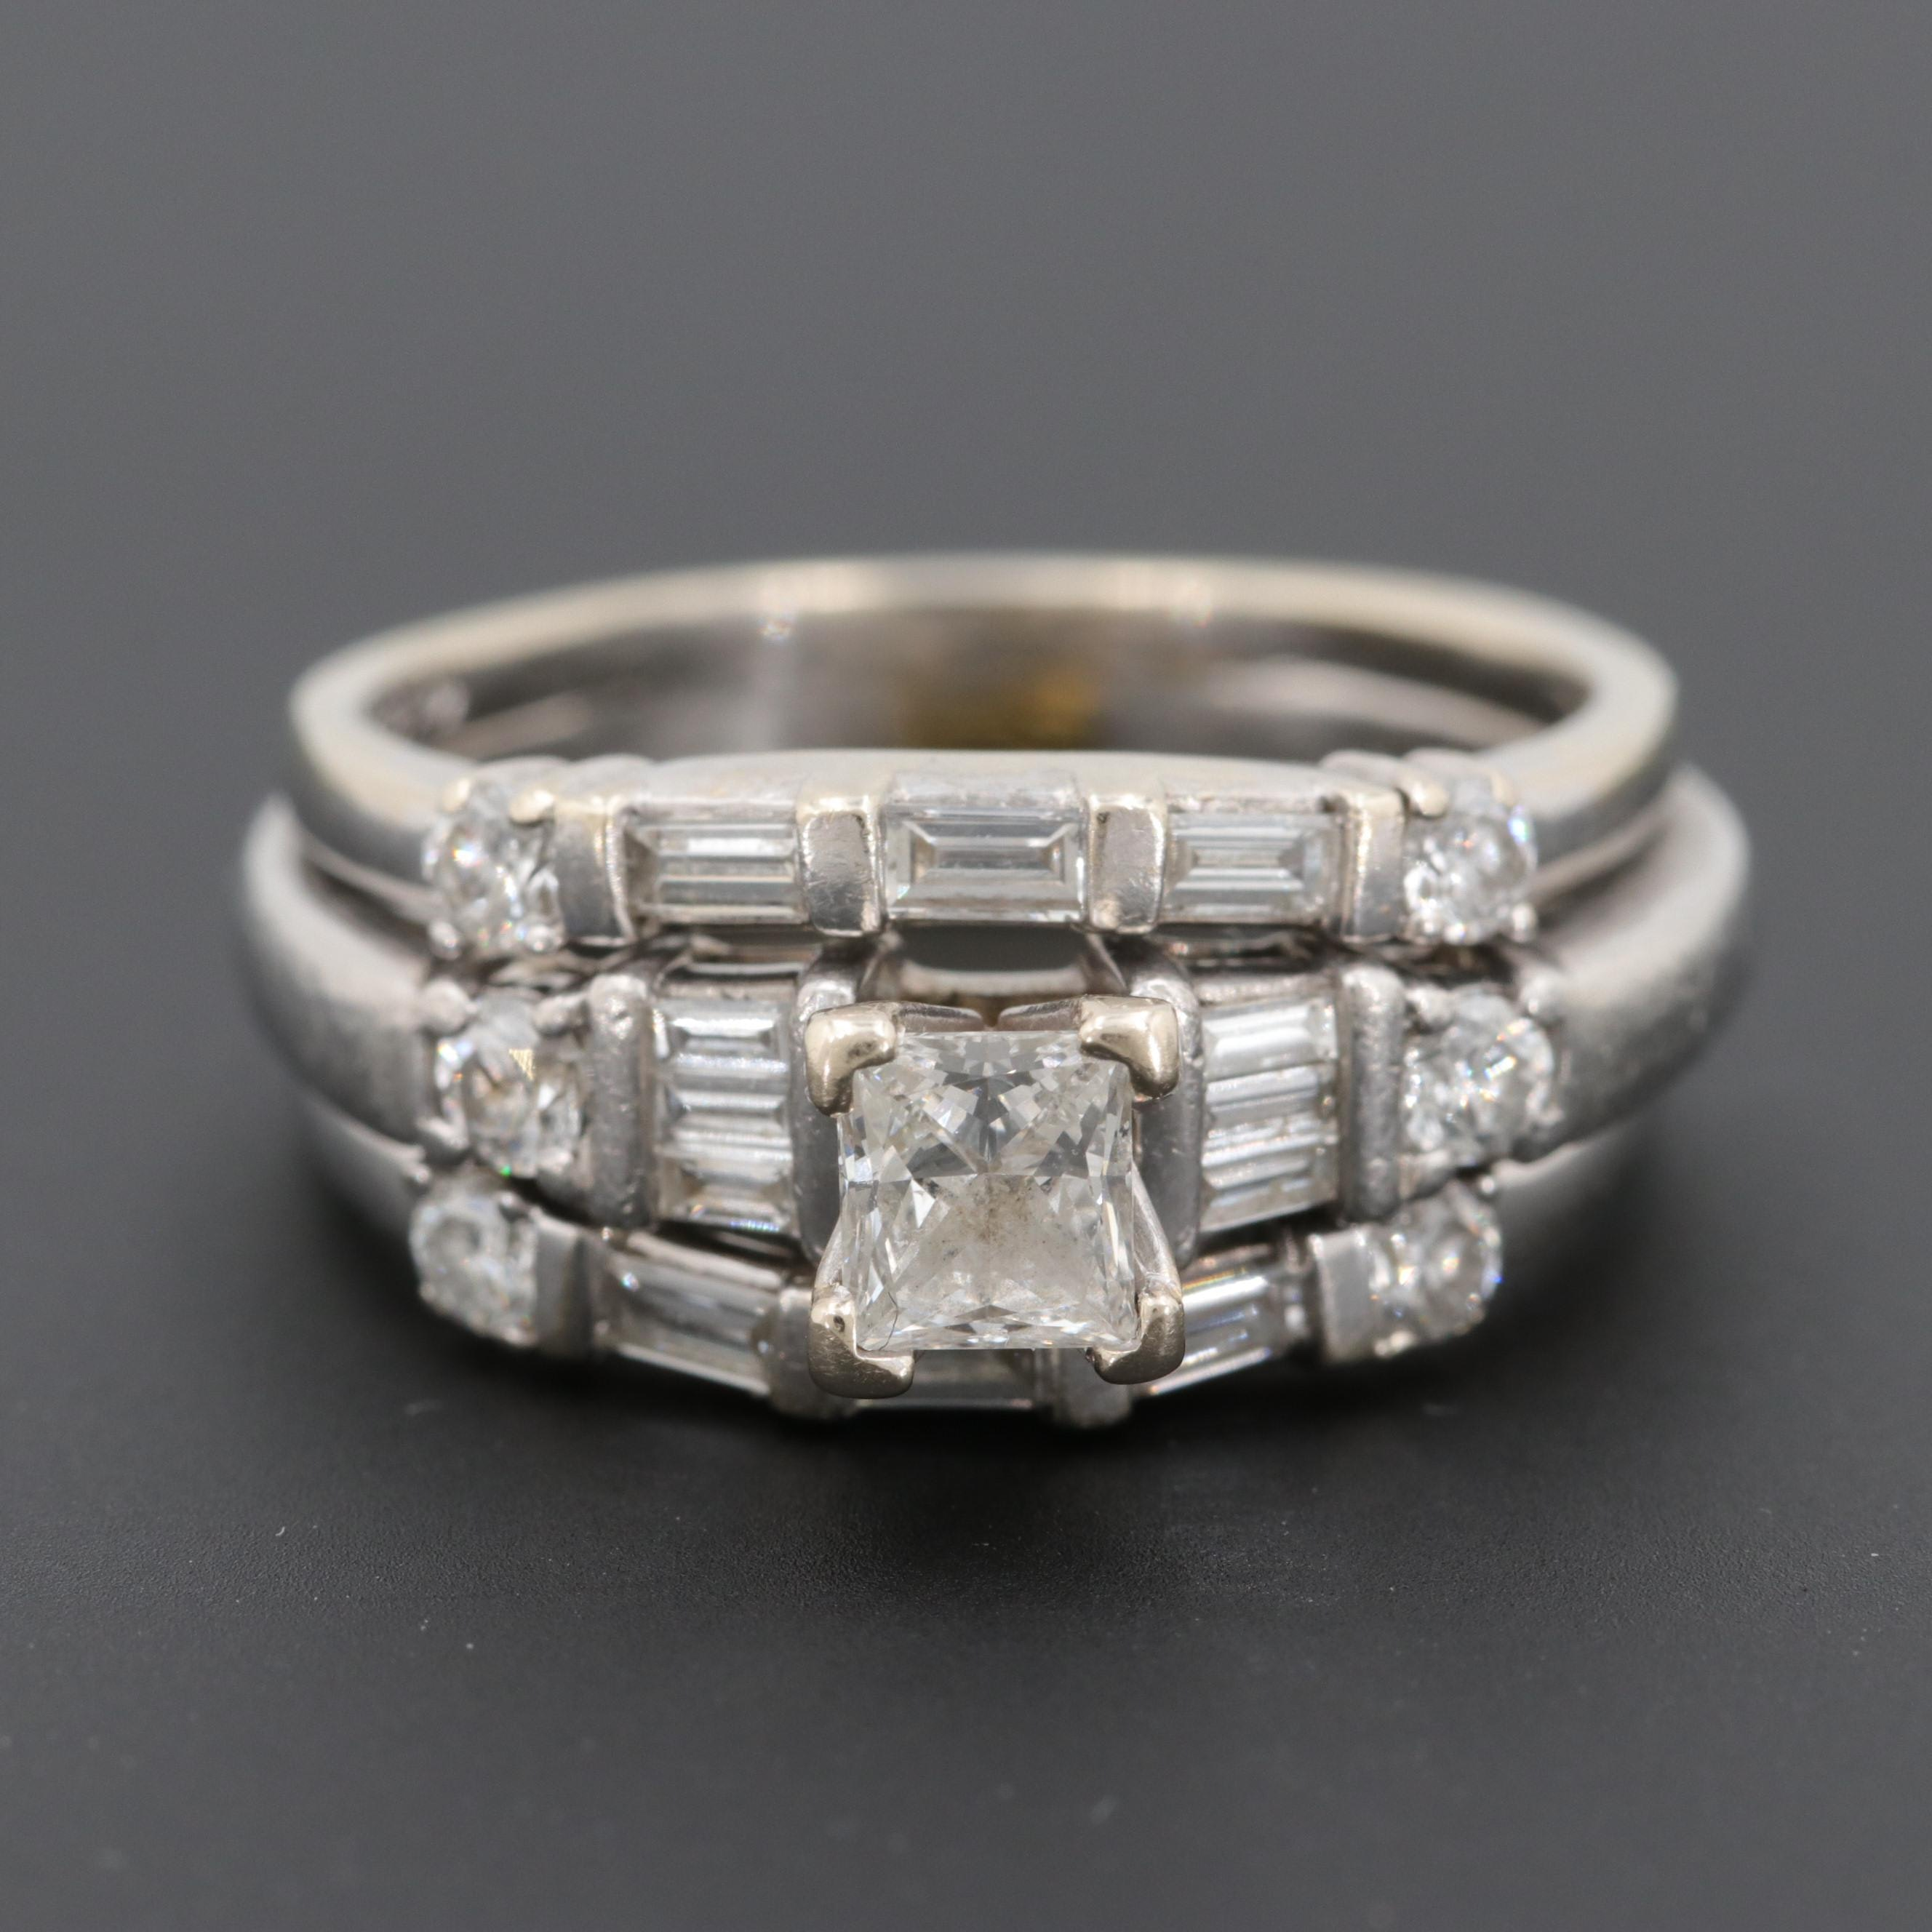 14K White Gold and Platinum 1.04 CTW Diamond Wedding Set